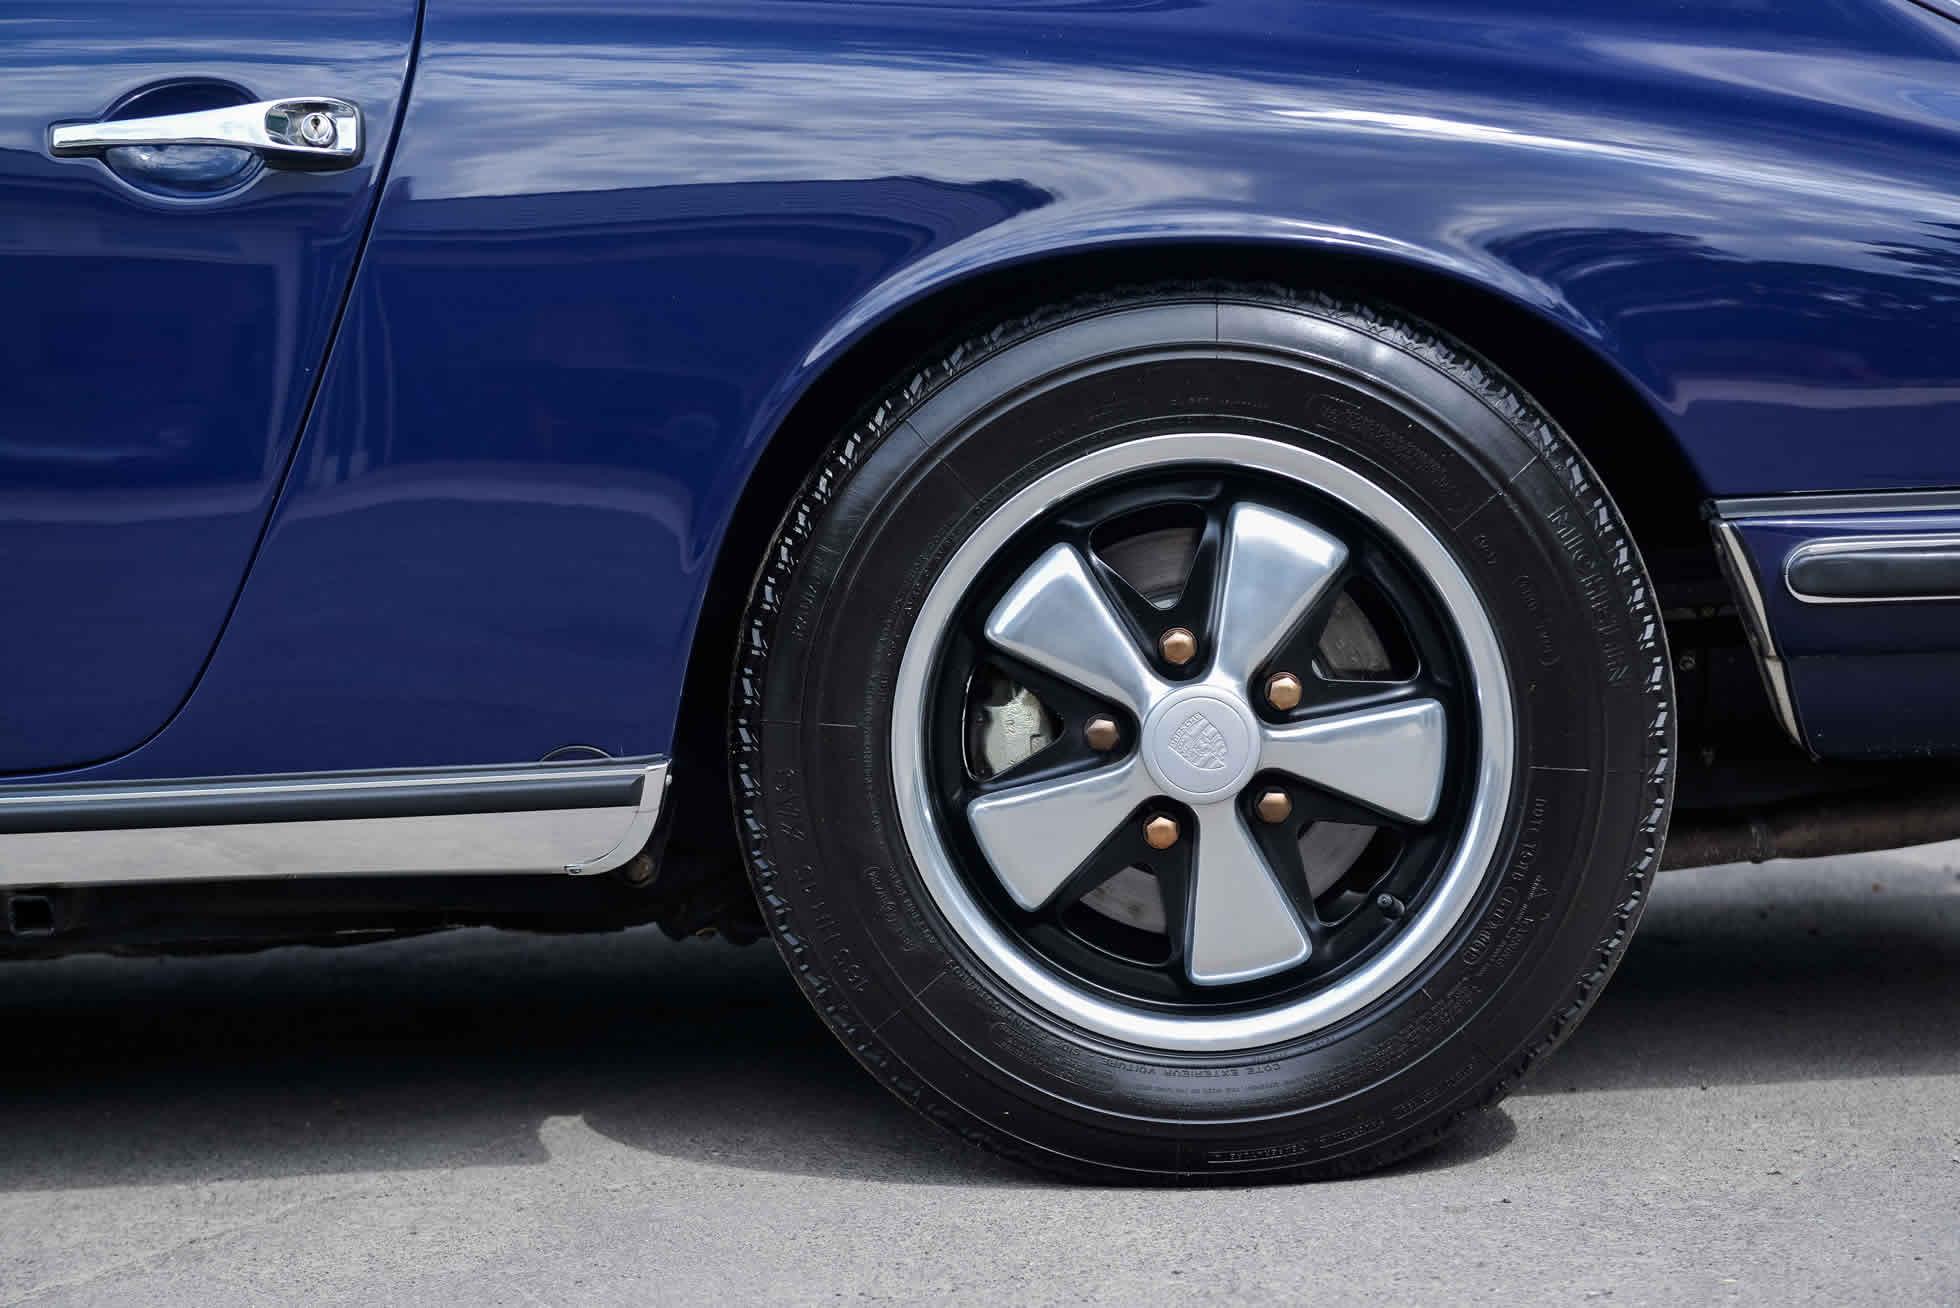 For Sale 1968 Porsche 911 S wheels